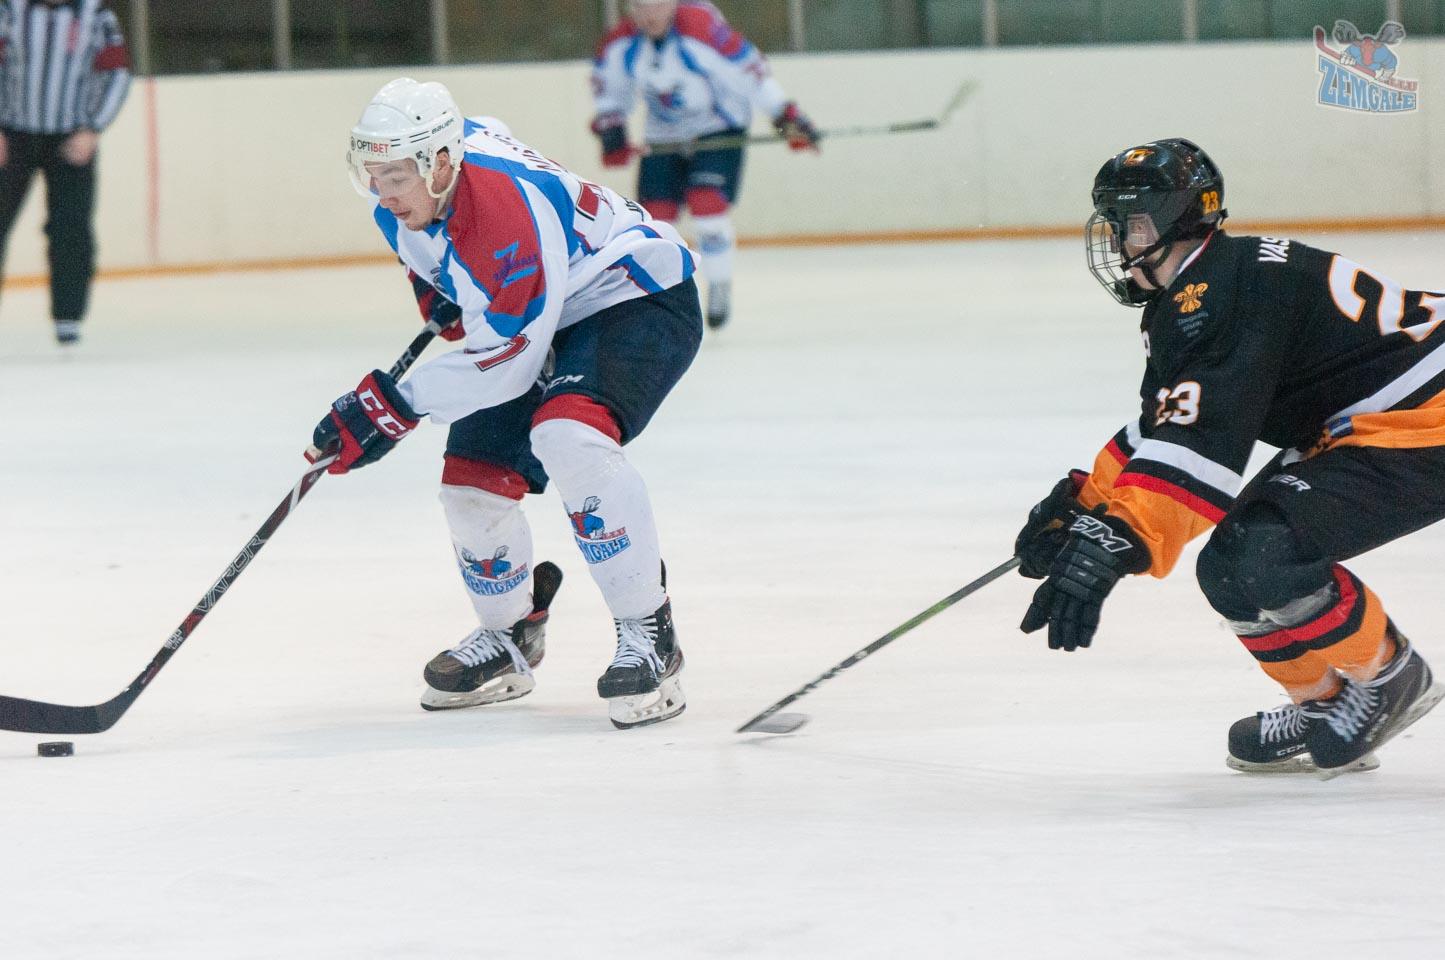 Hokeja uzbrucēj uzbrukumā ar ripu